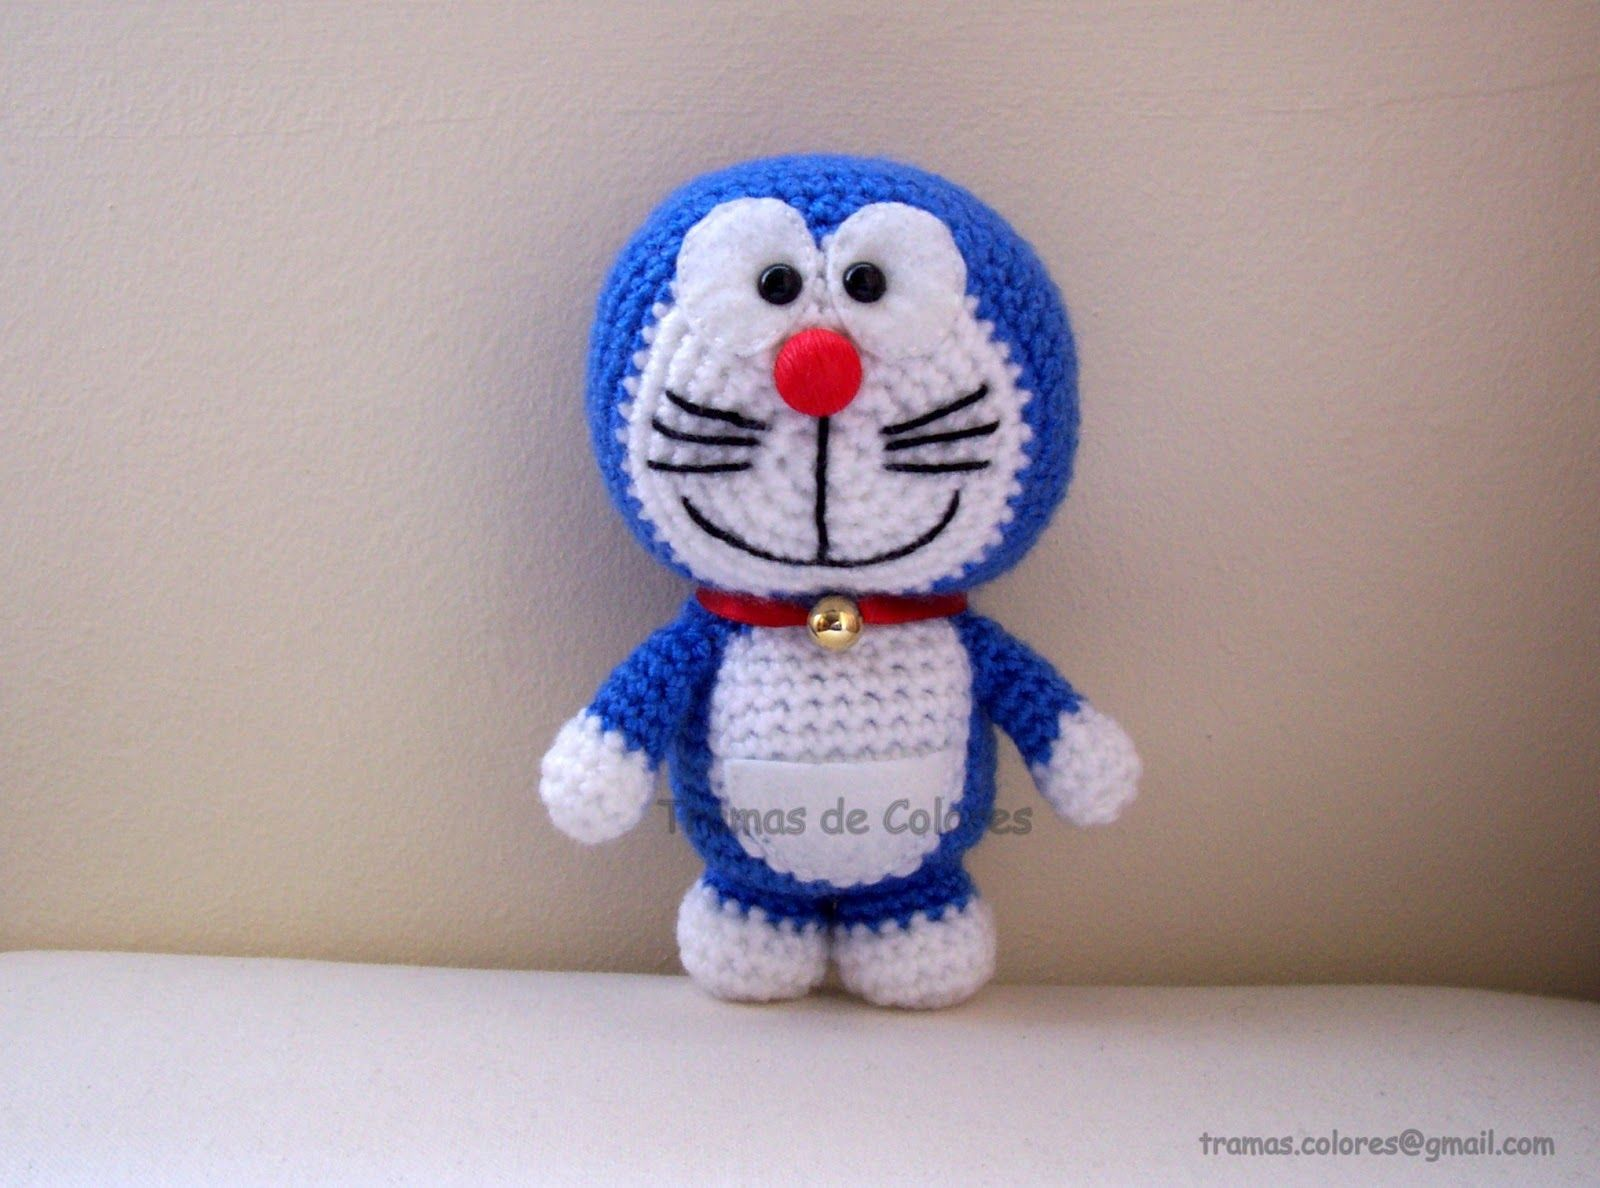 Amigurumi Doraemon Free Pattern : Doraemon amigurumi amigurumis pinterest amigurumi crochet and